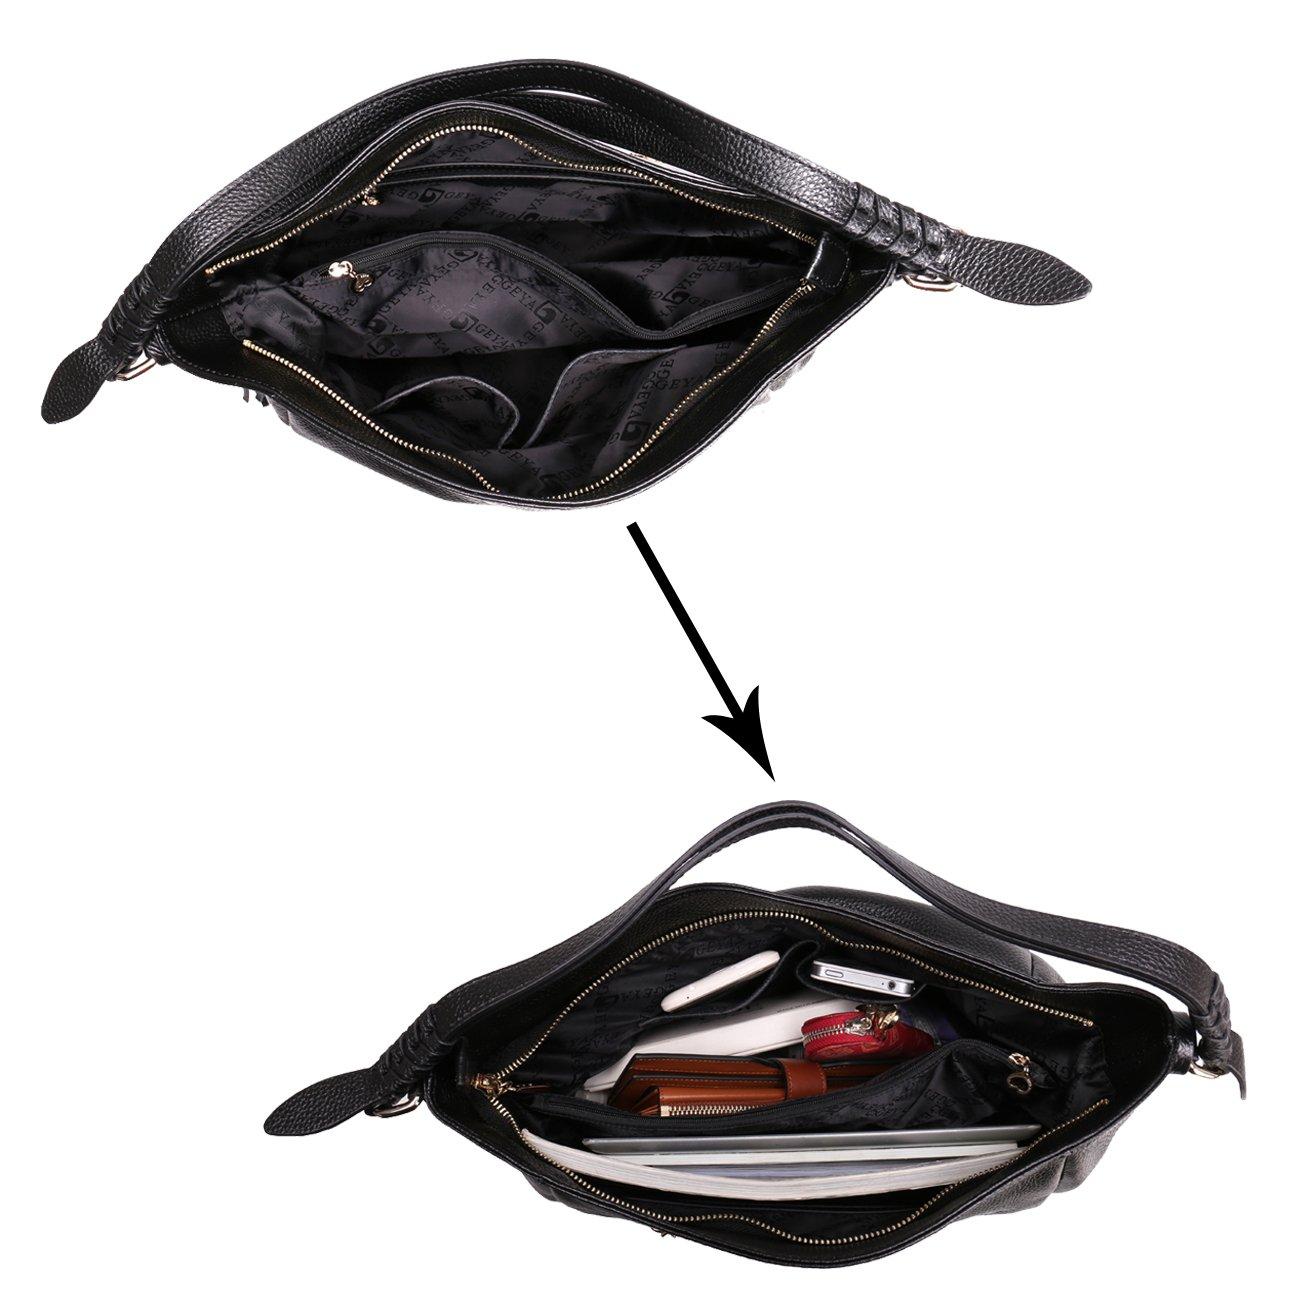 Geya Women's Fashion Genuine Leather Handbag Shoulder Handbag with Imported Soft Hot Leather (Black) by Geya (Image #4)